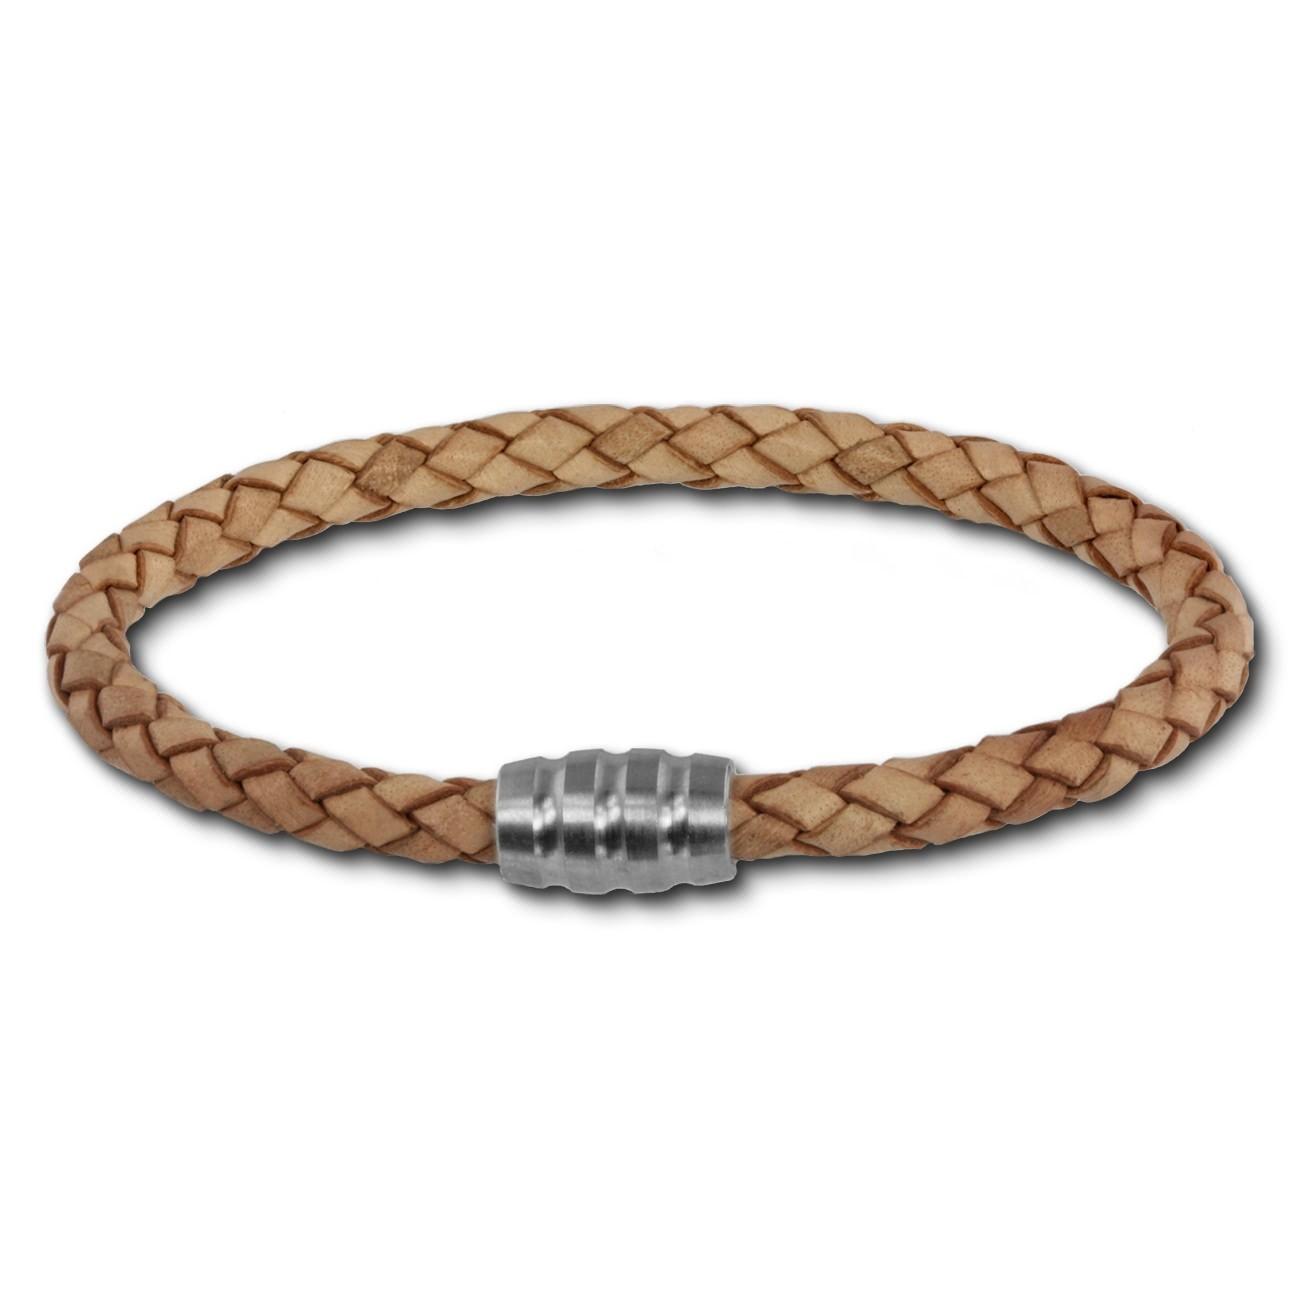 SilberDream Leder Armband 5mm natur 22cm Edelstahl Verschluss LAB0722